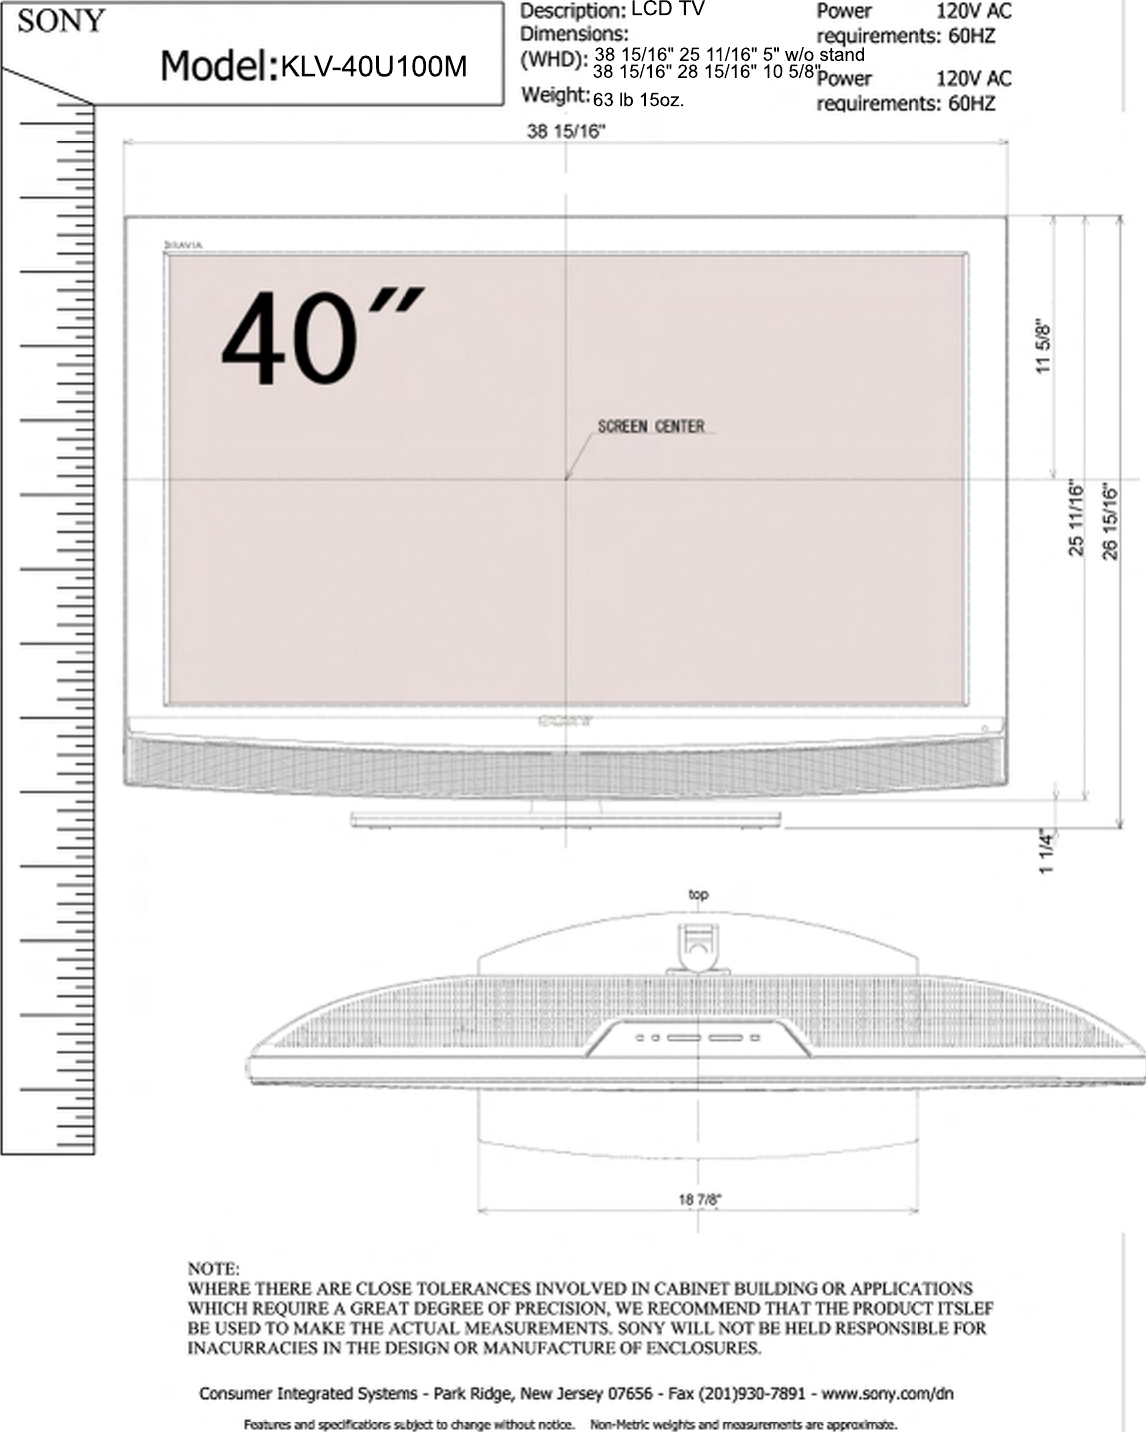 sony klv 40u100m cut psd user manual dimensions diagram klv40u100m rh usermanual wiki Sony Bravia TV HDMI Ports Sony Bravia TV HDMI Ports